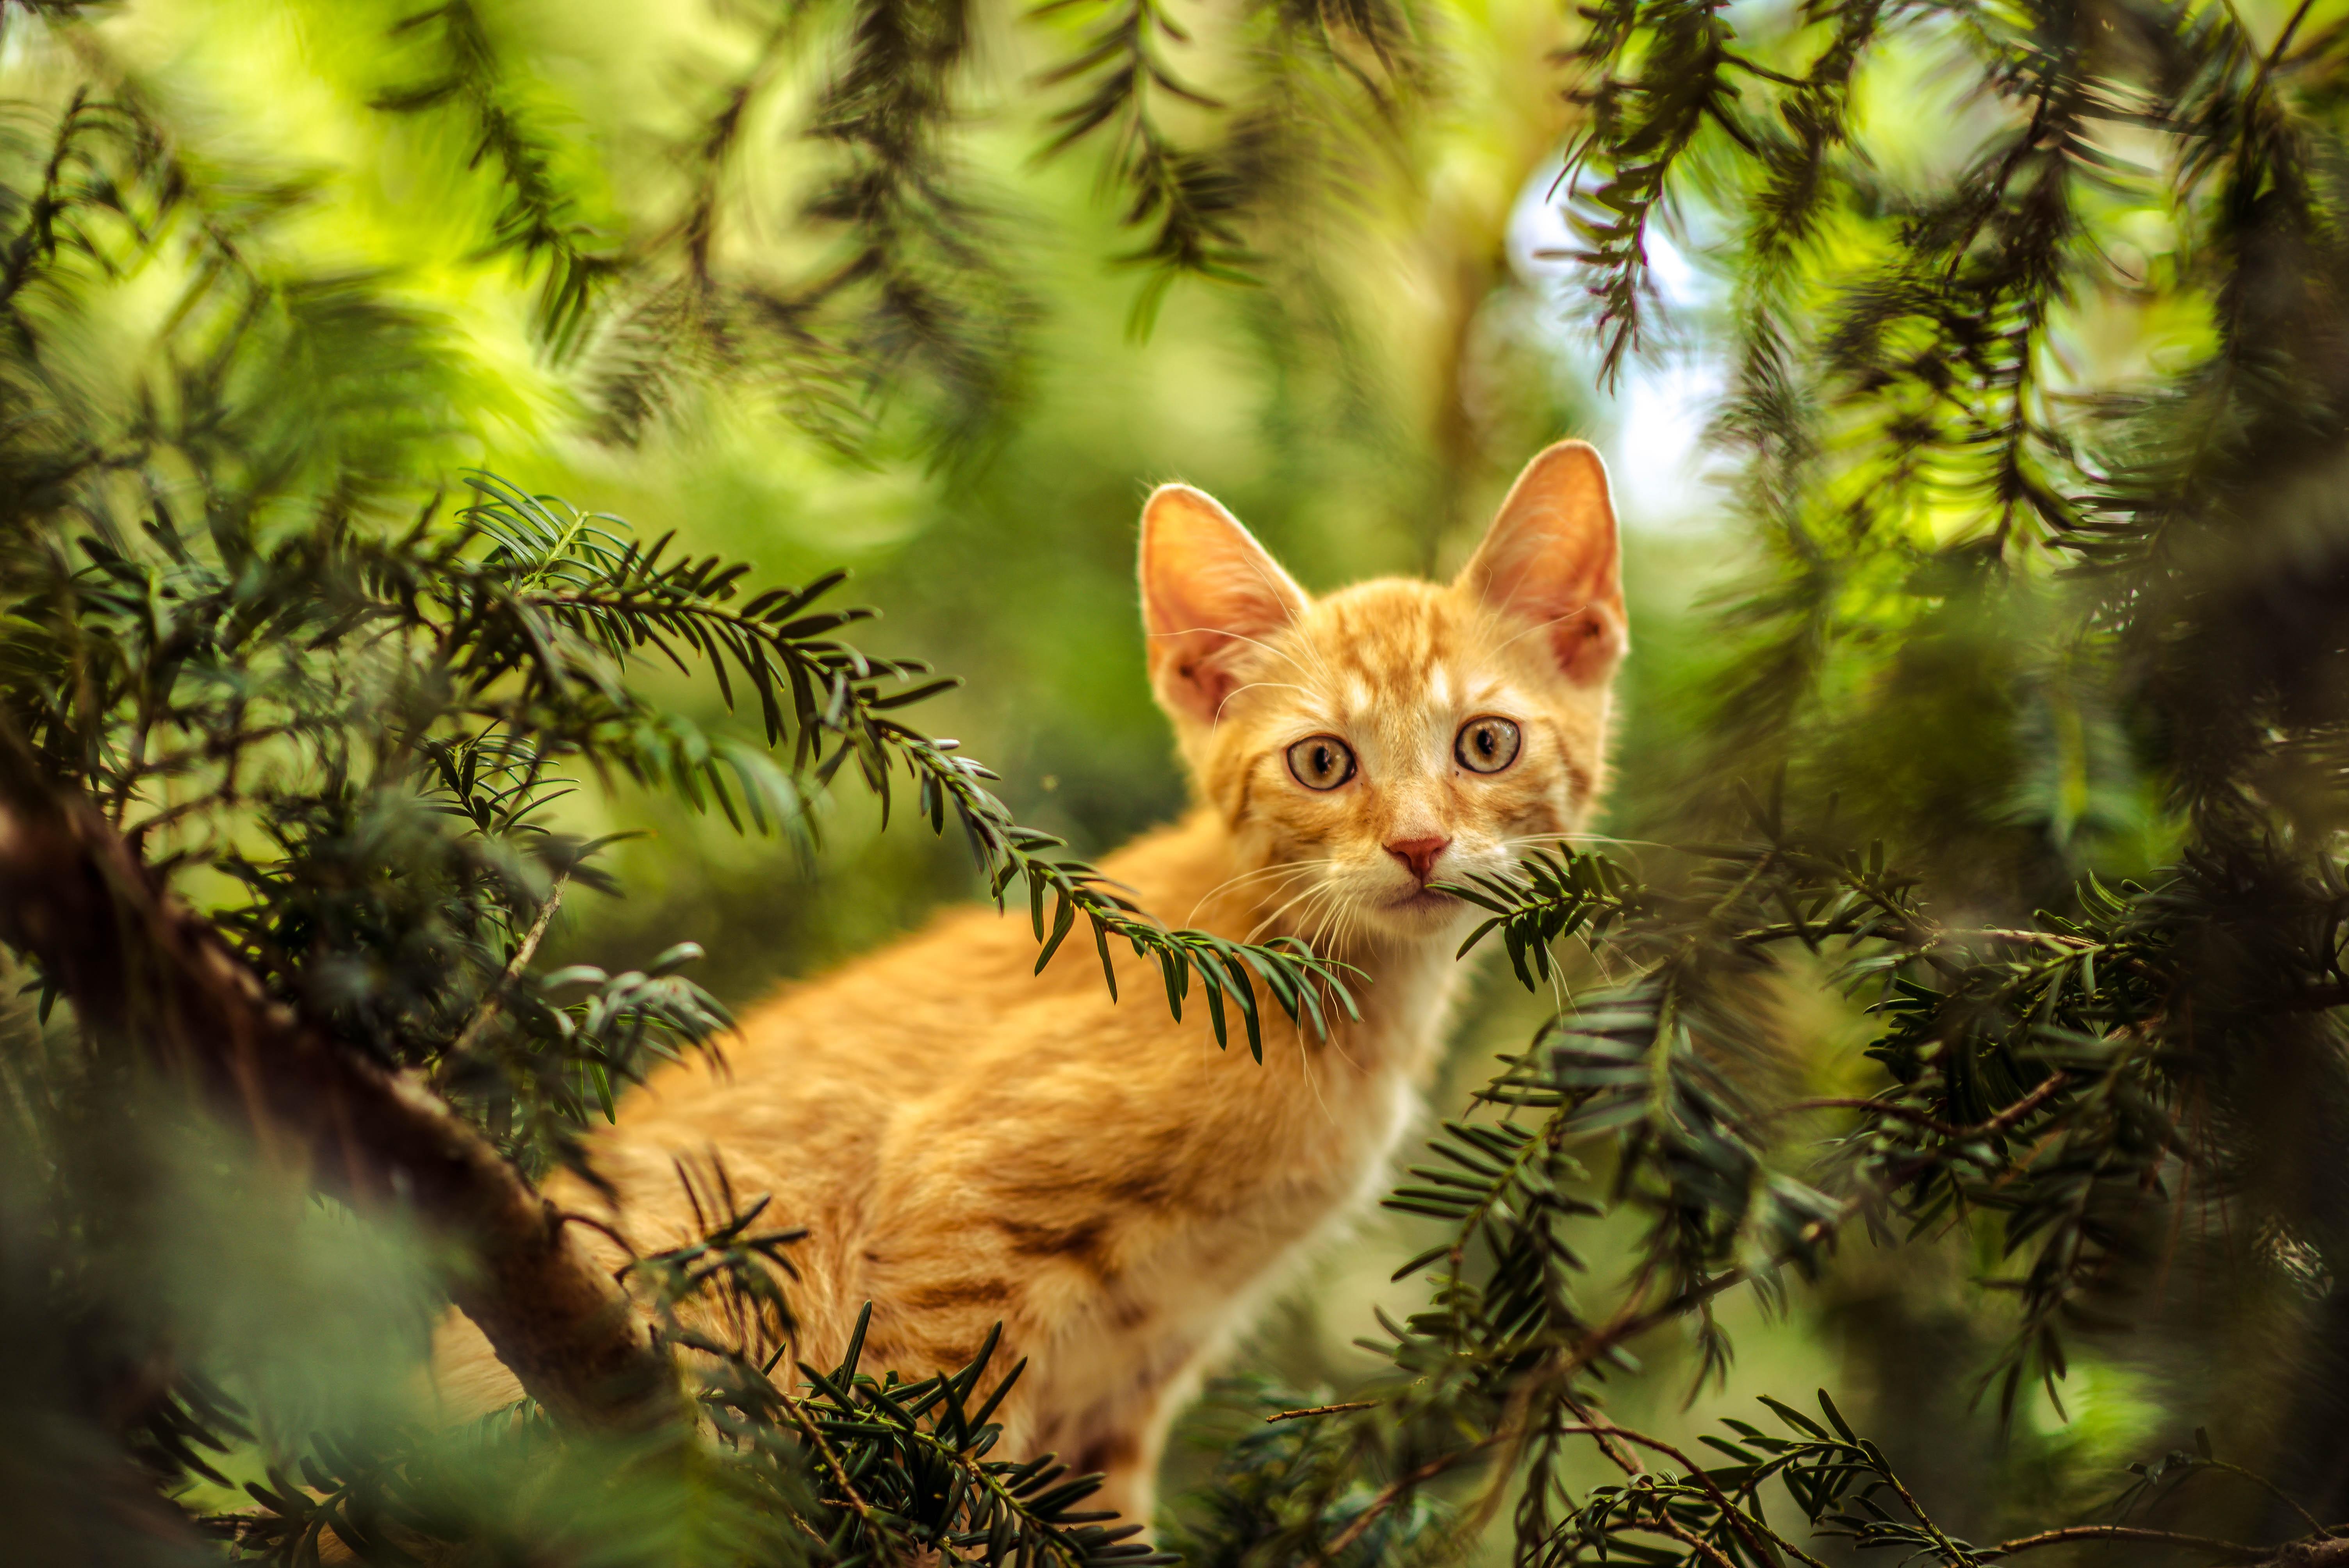 Картинки с кошками в лесу